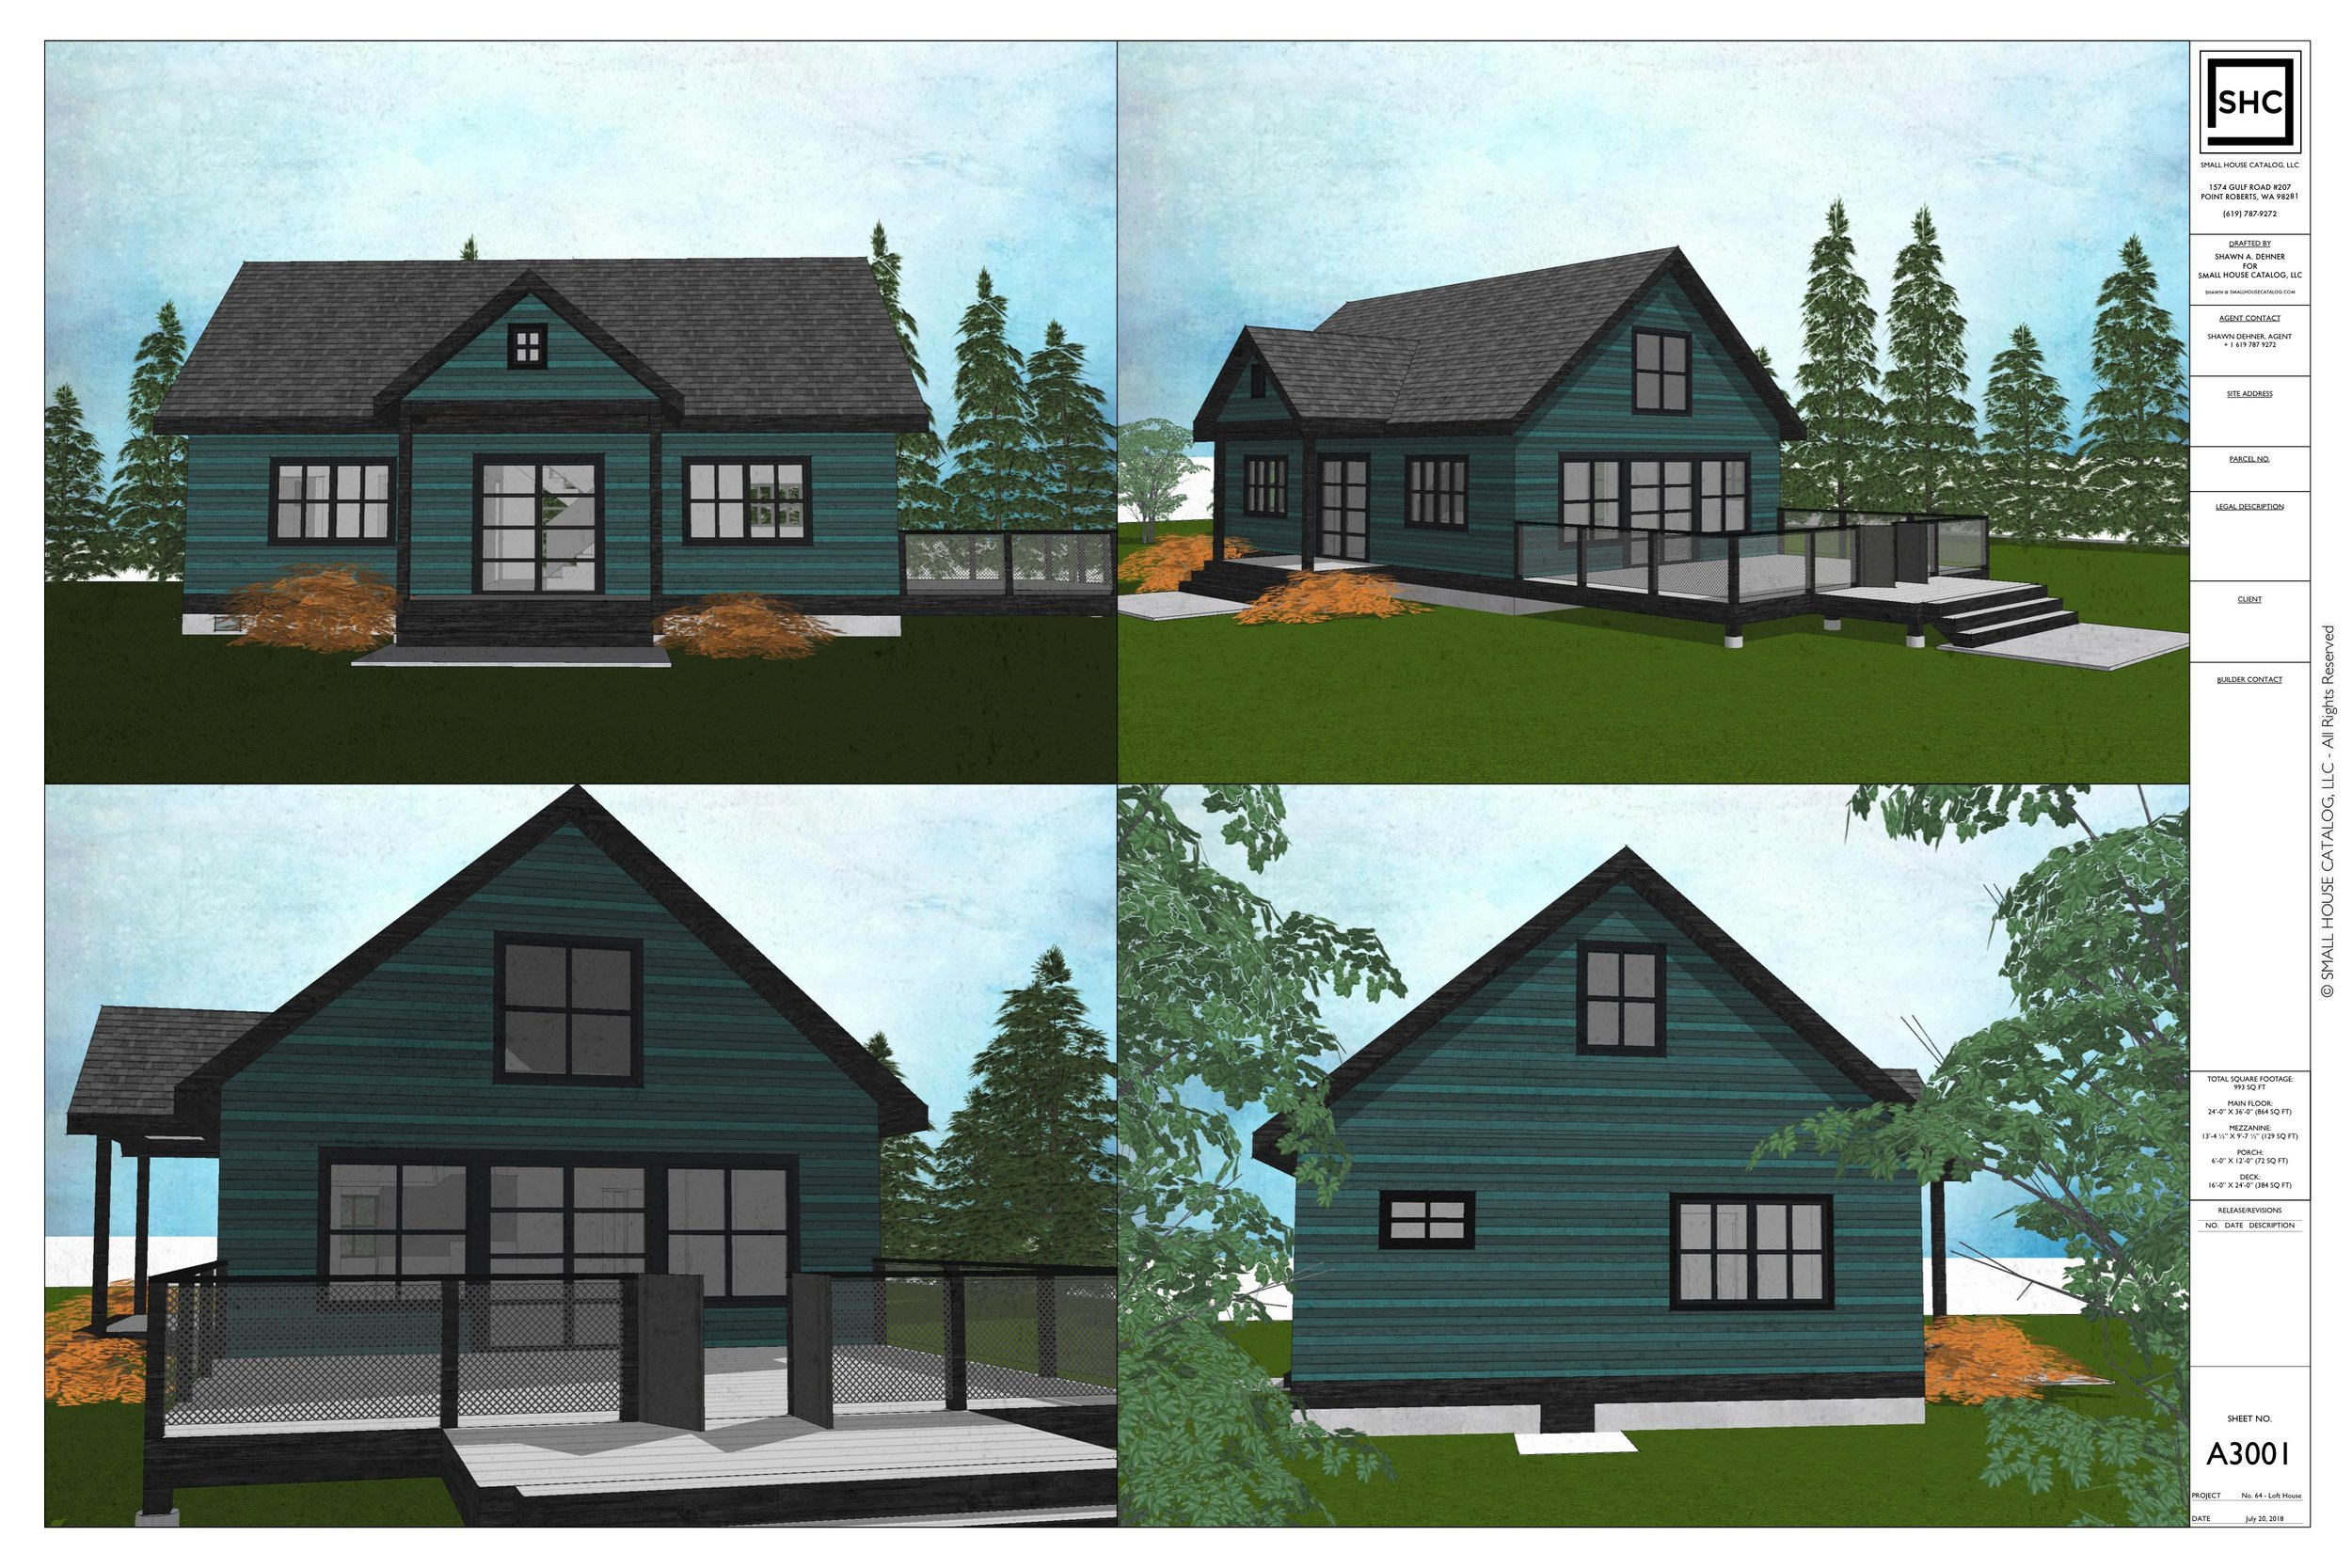 Plan No. 64 - The Loft House